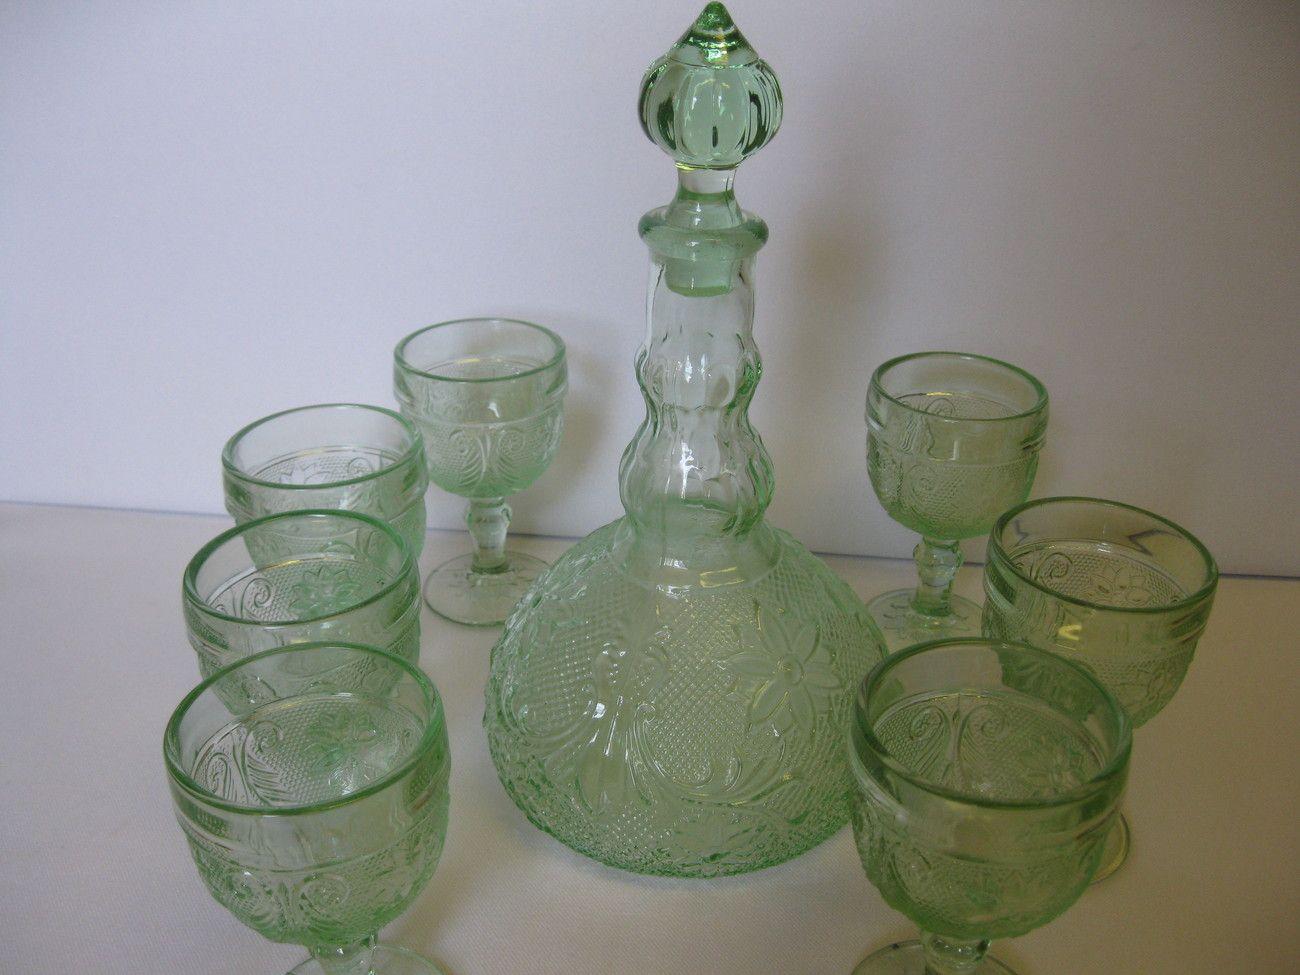 Mid Century Modern Cocktail Glasses   Vintage Libbey Nordic Glasses   Set  Of 7   Turquoise   White   Green   Rocks Glasses   Mad Men Barware |  Pinterest ...